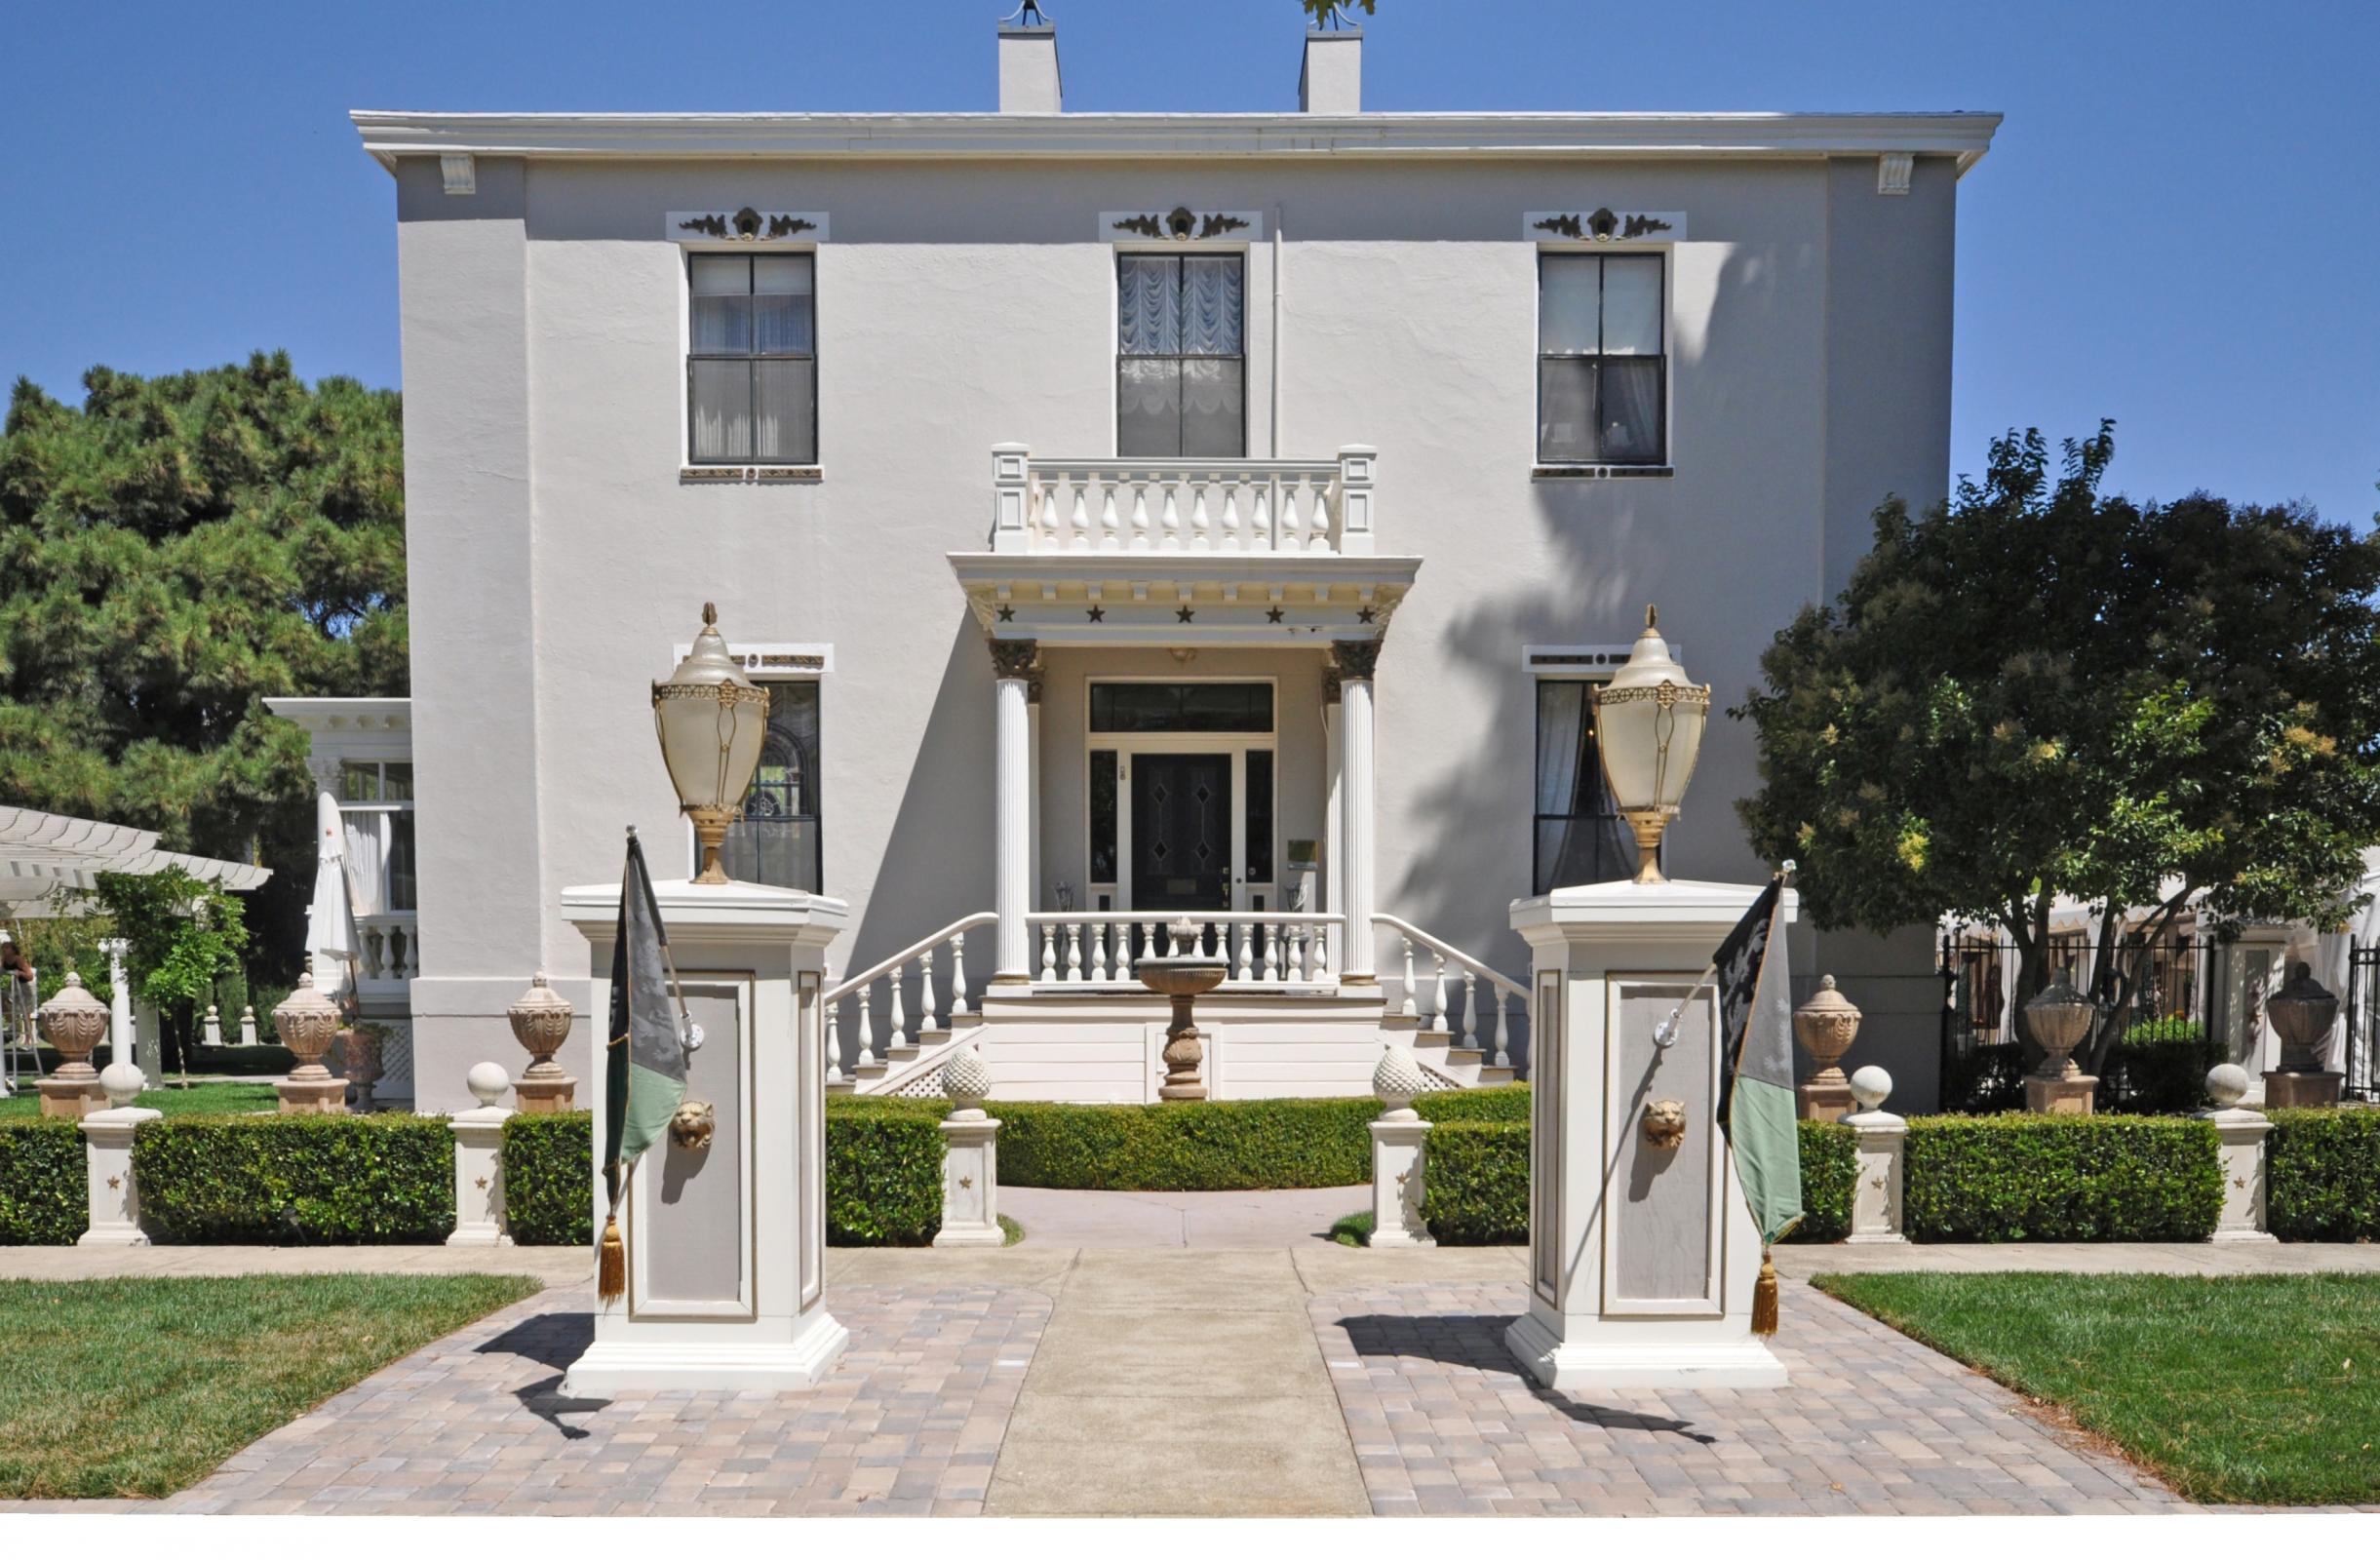 Jefferson street mansion 1063 jefferson street benicia